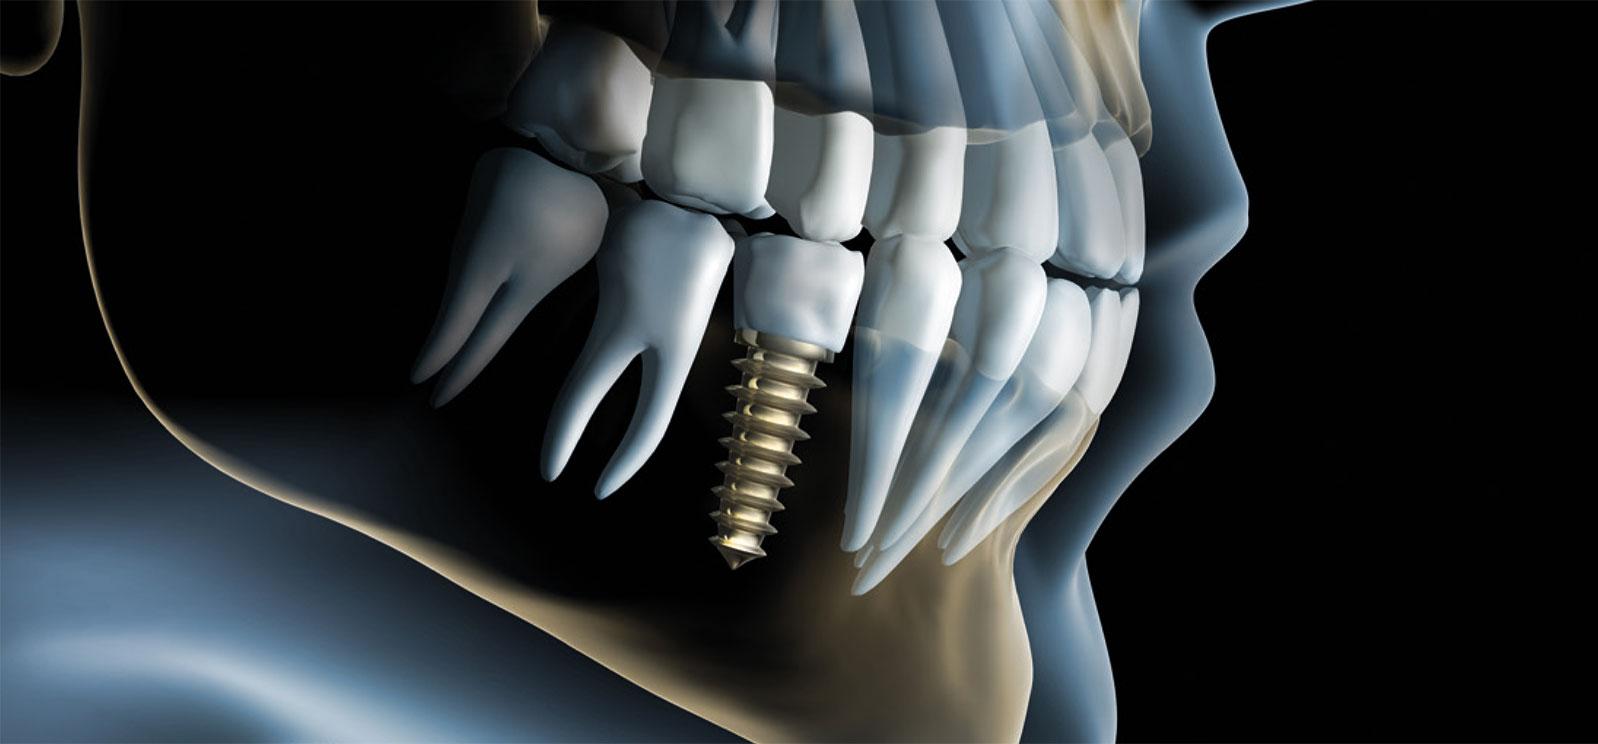 Transparenter Kiefer mit Implantat